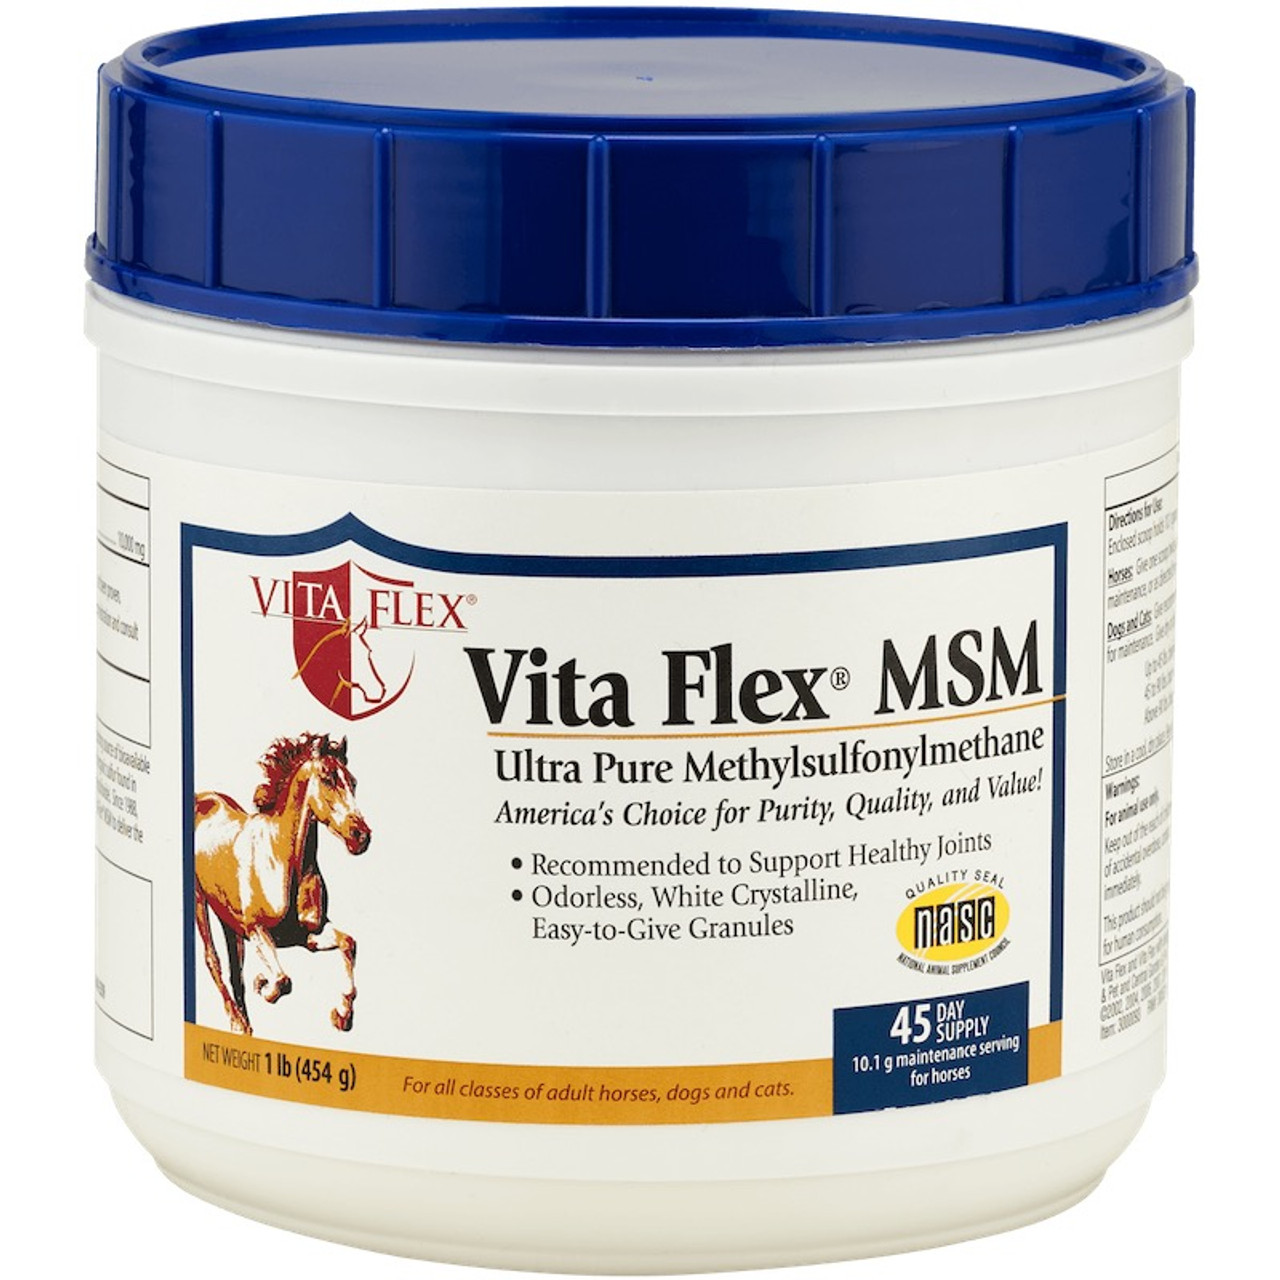 Vita Flex MSM